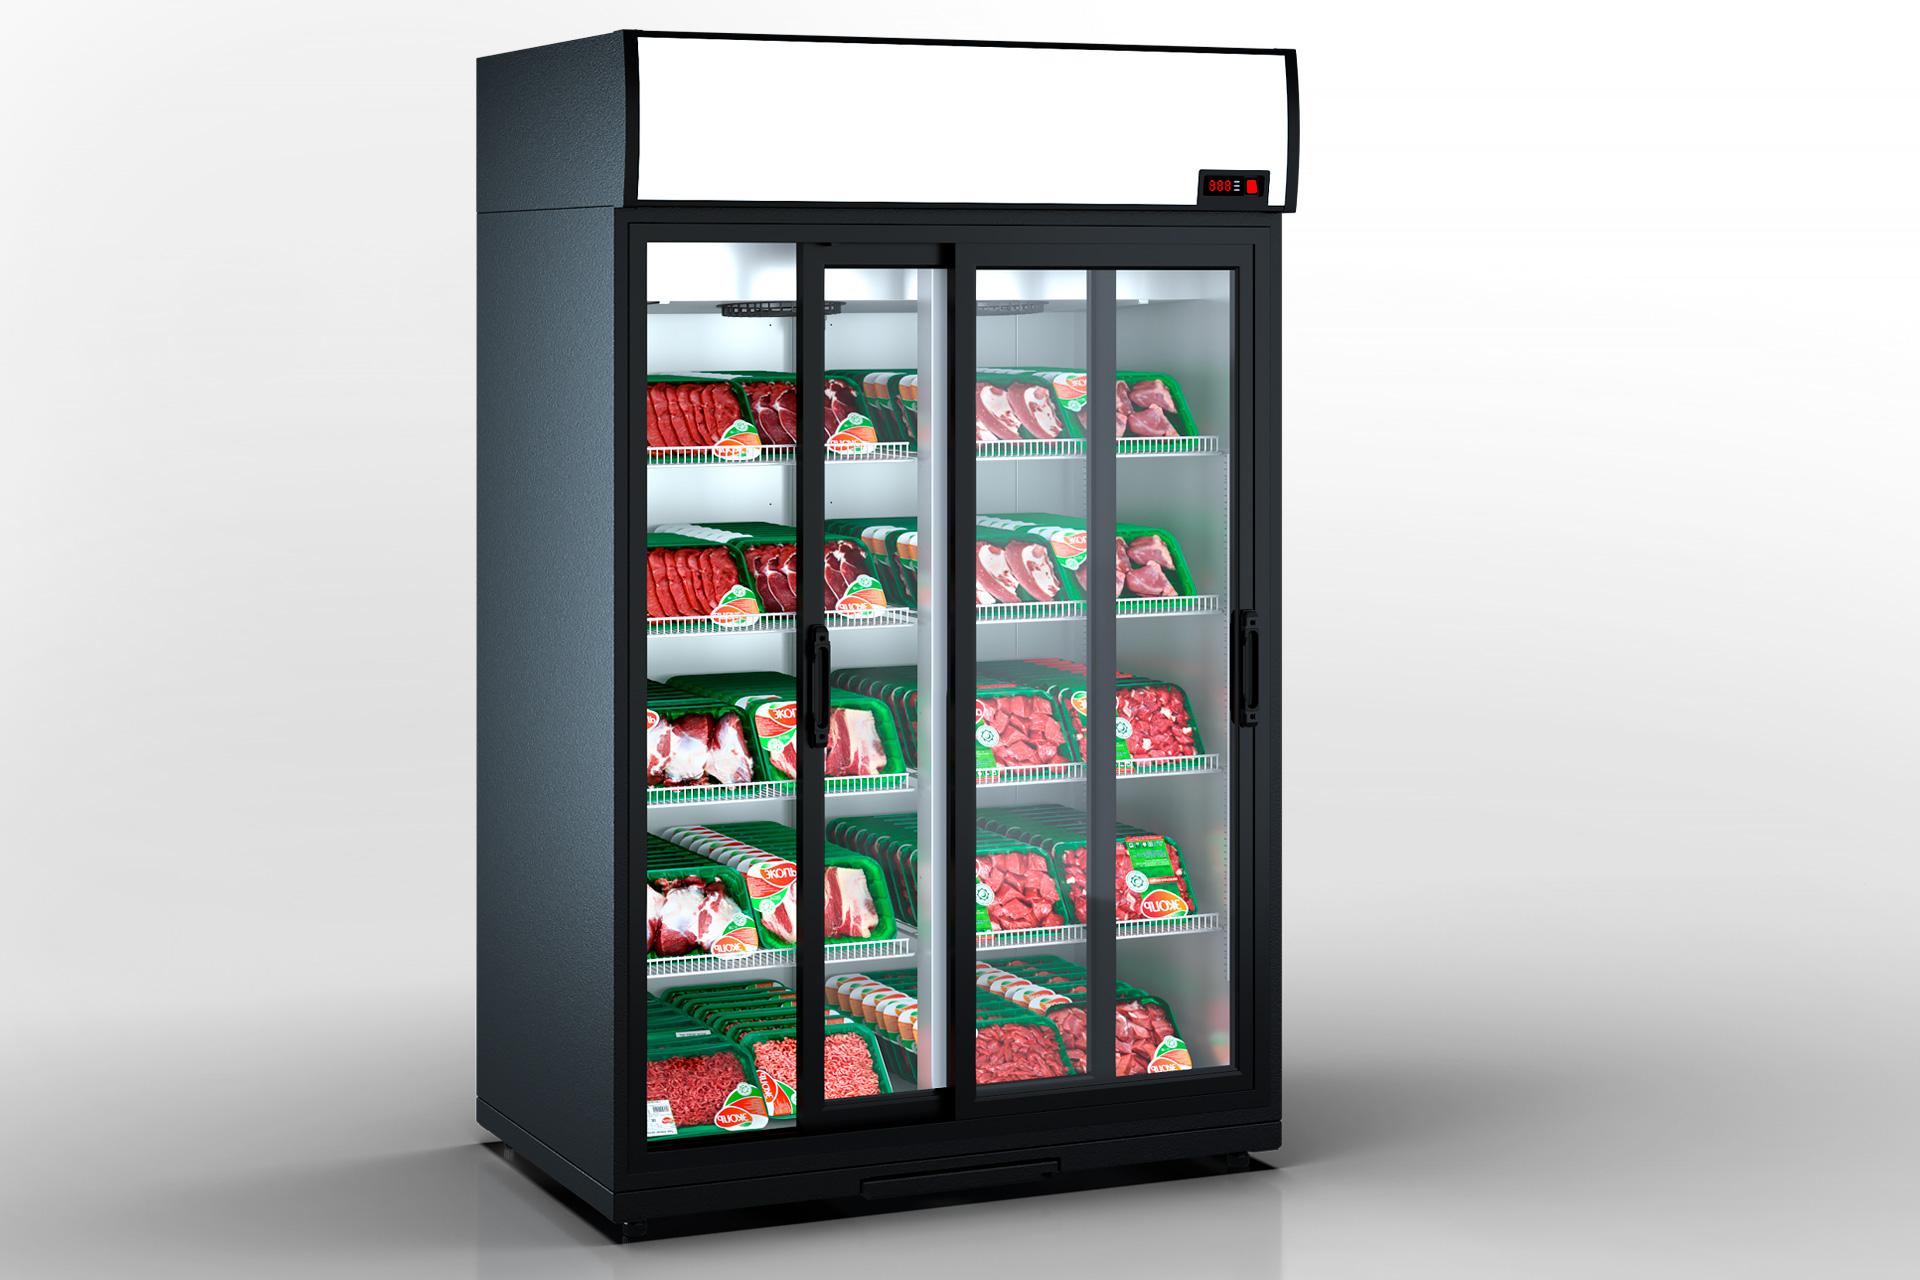 Refrigerated cabinets Kansas VА1SG 080 HT SD 210-D1200A-132